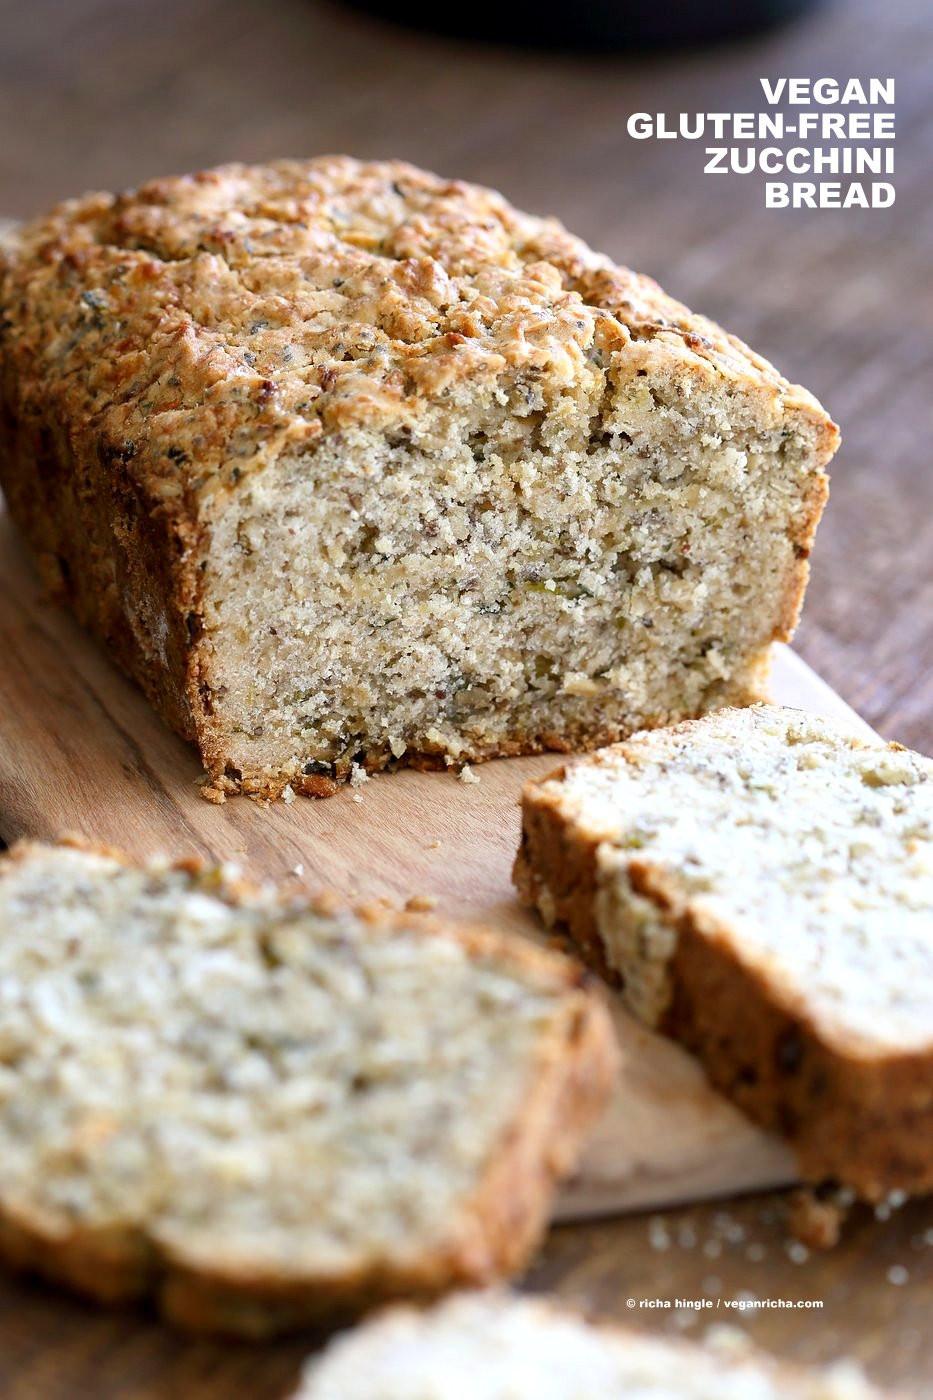 Healthy Gluten Free Bread Recipe  Vegan Gluten free Zucchini Bread Recipe Vegan Richa